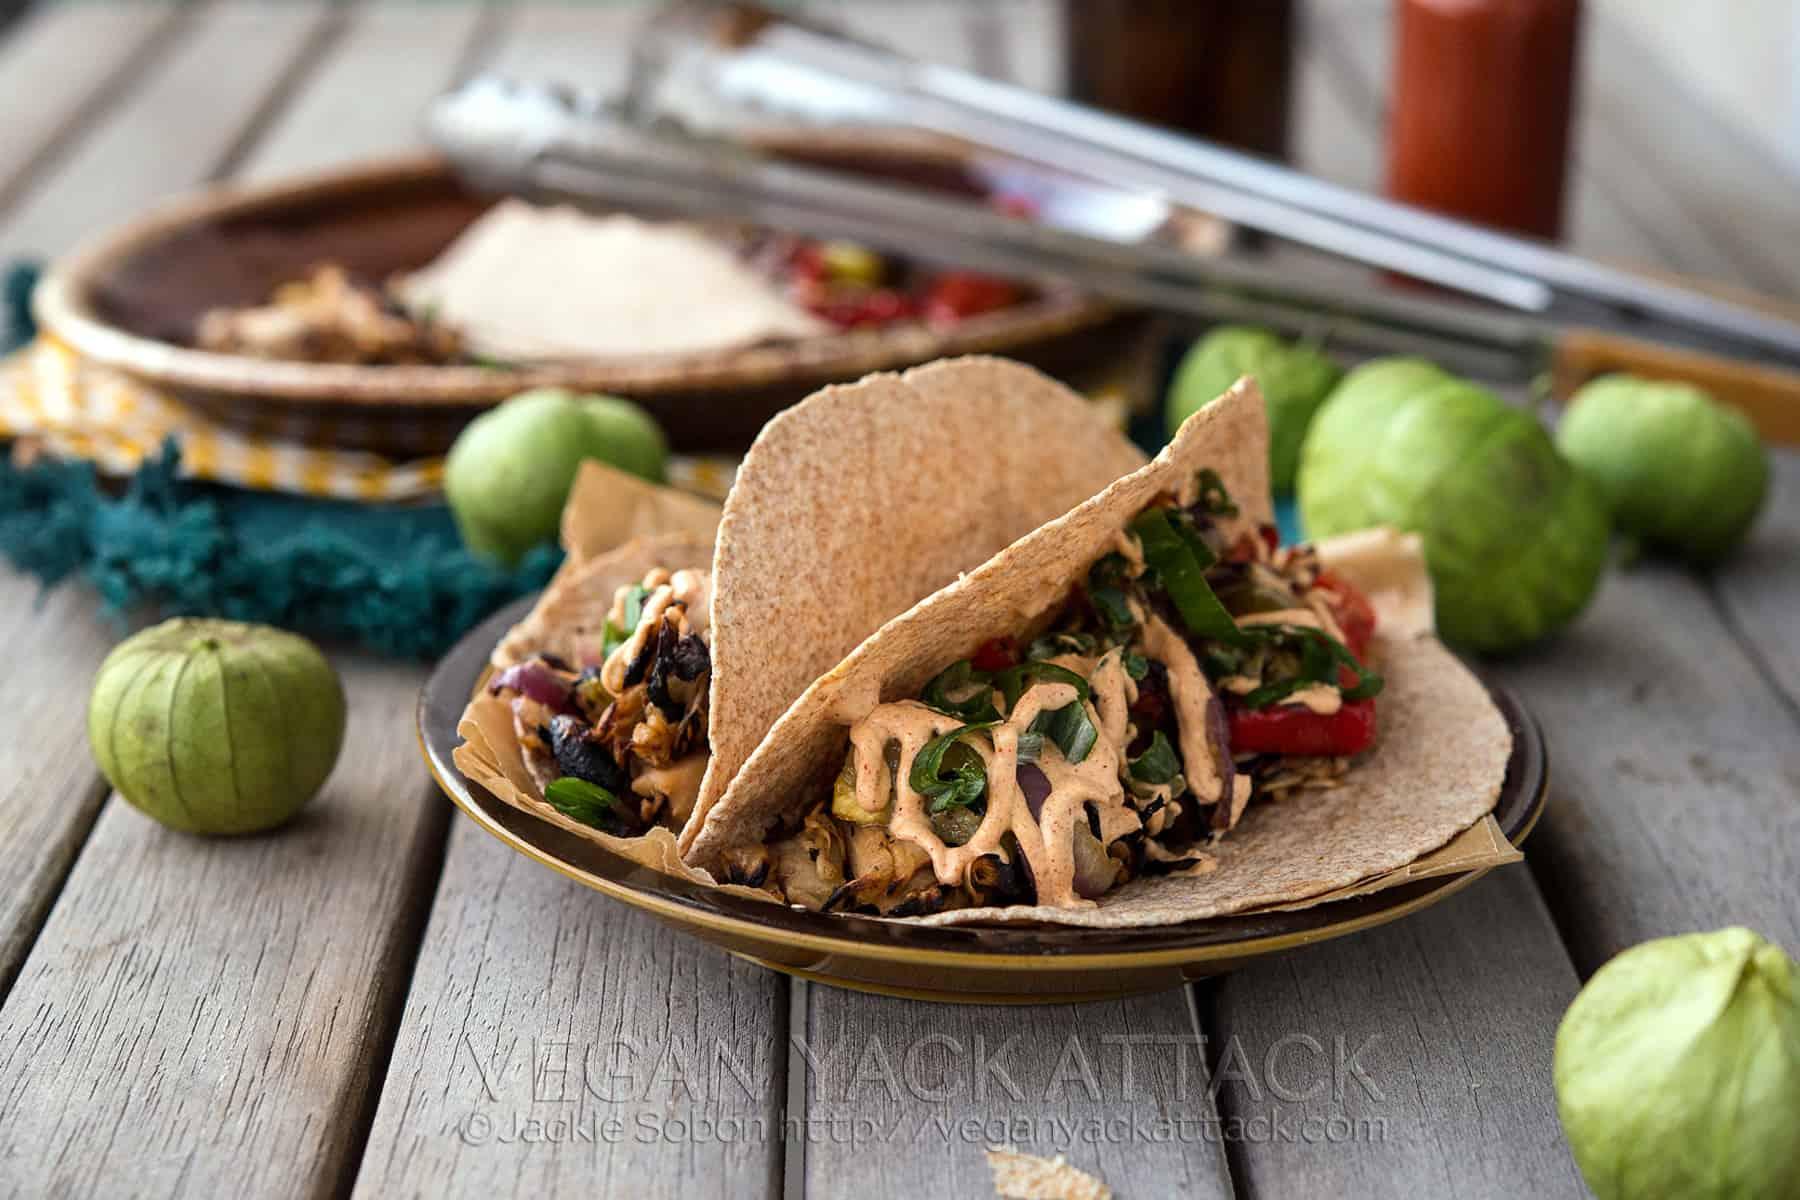 Beefy Jackfruit Tacos